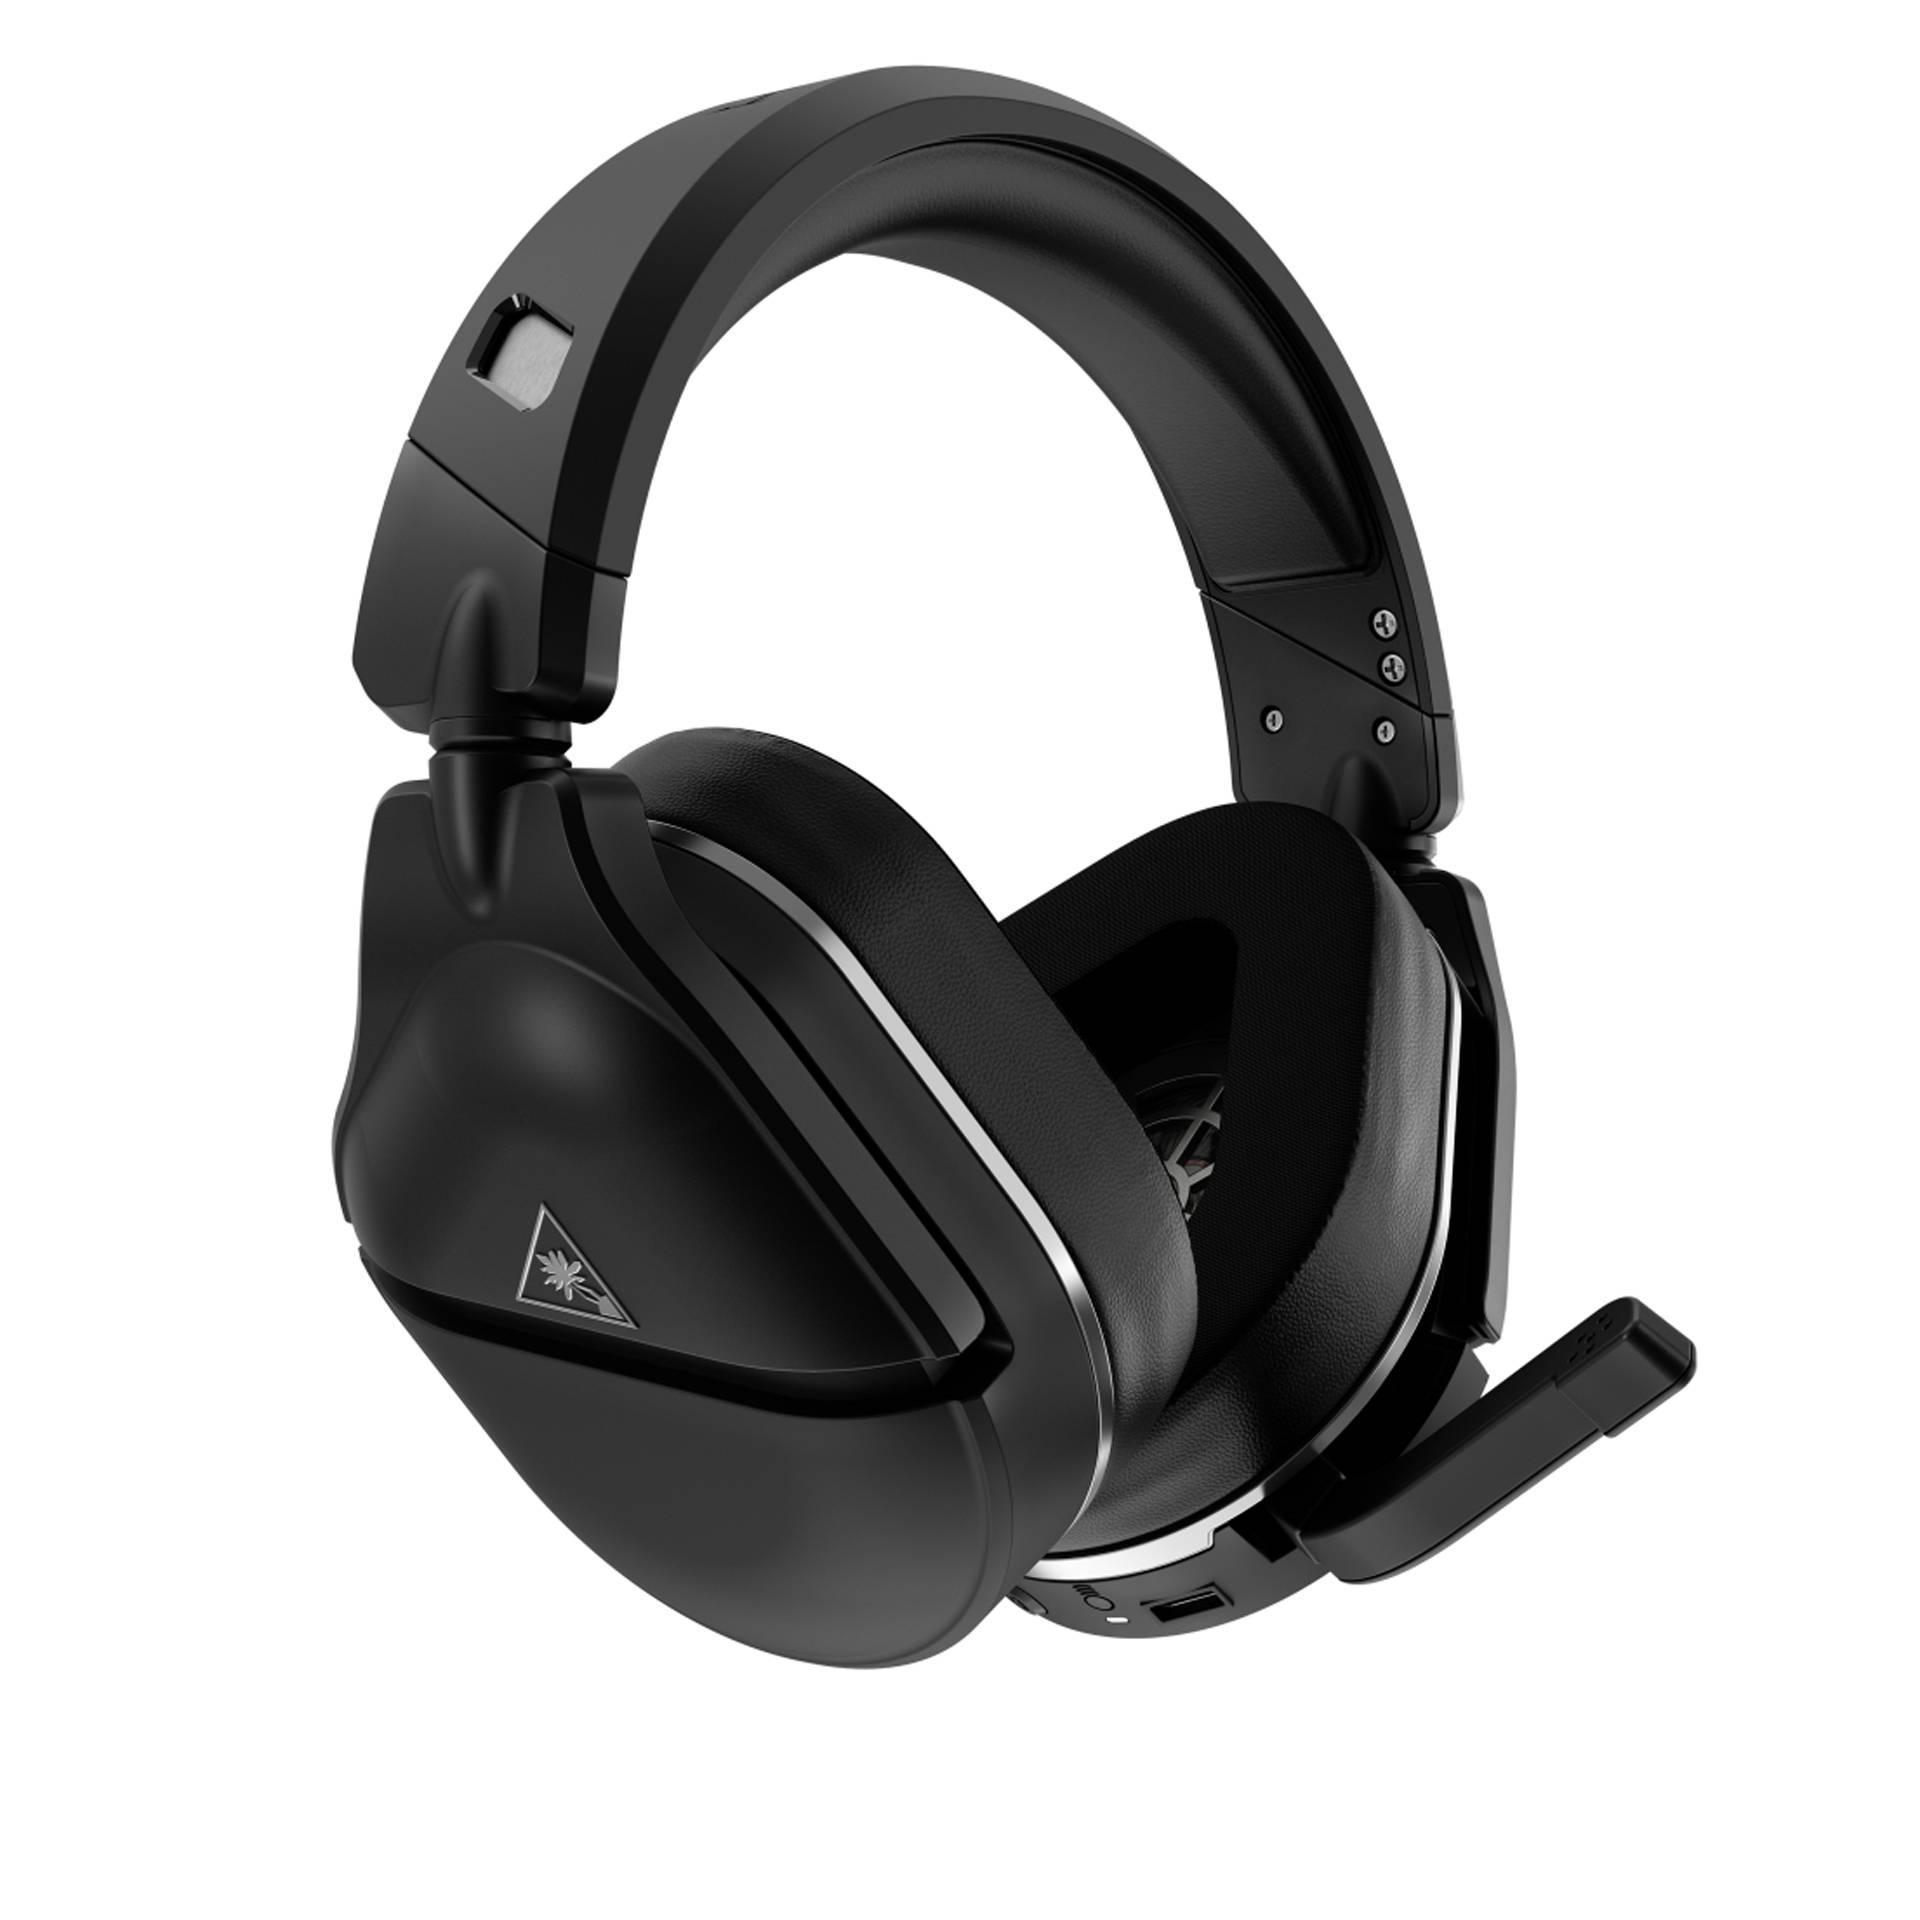 Turtle Beach Stealth 700X Gen 2 Gaming Headset black